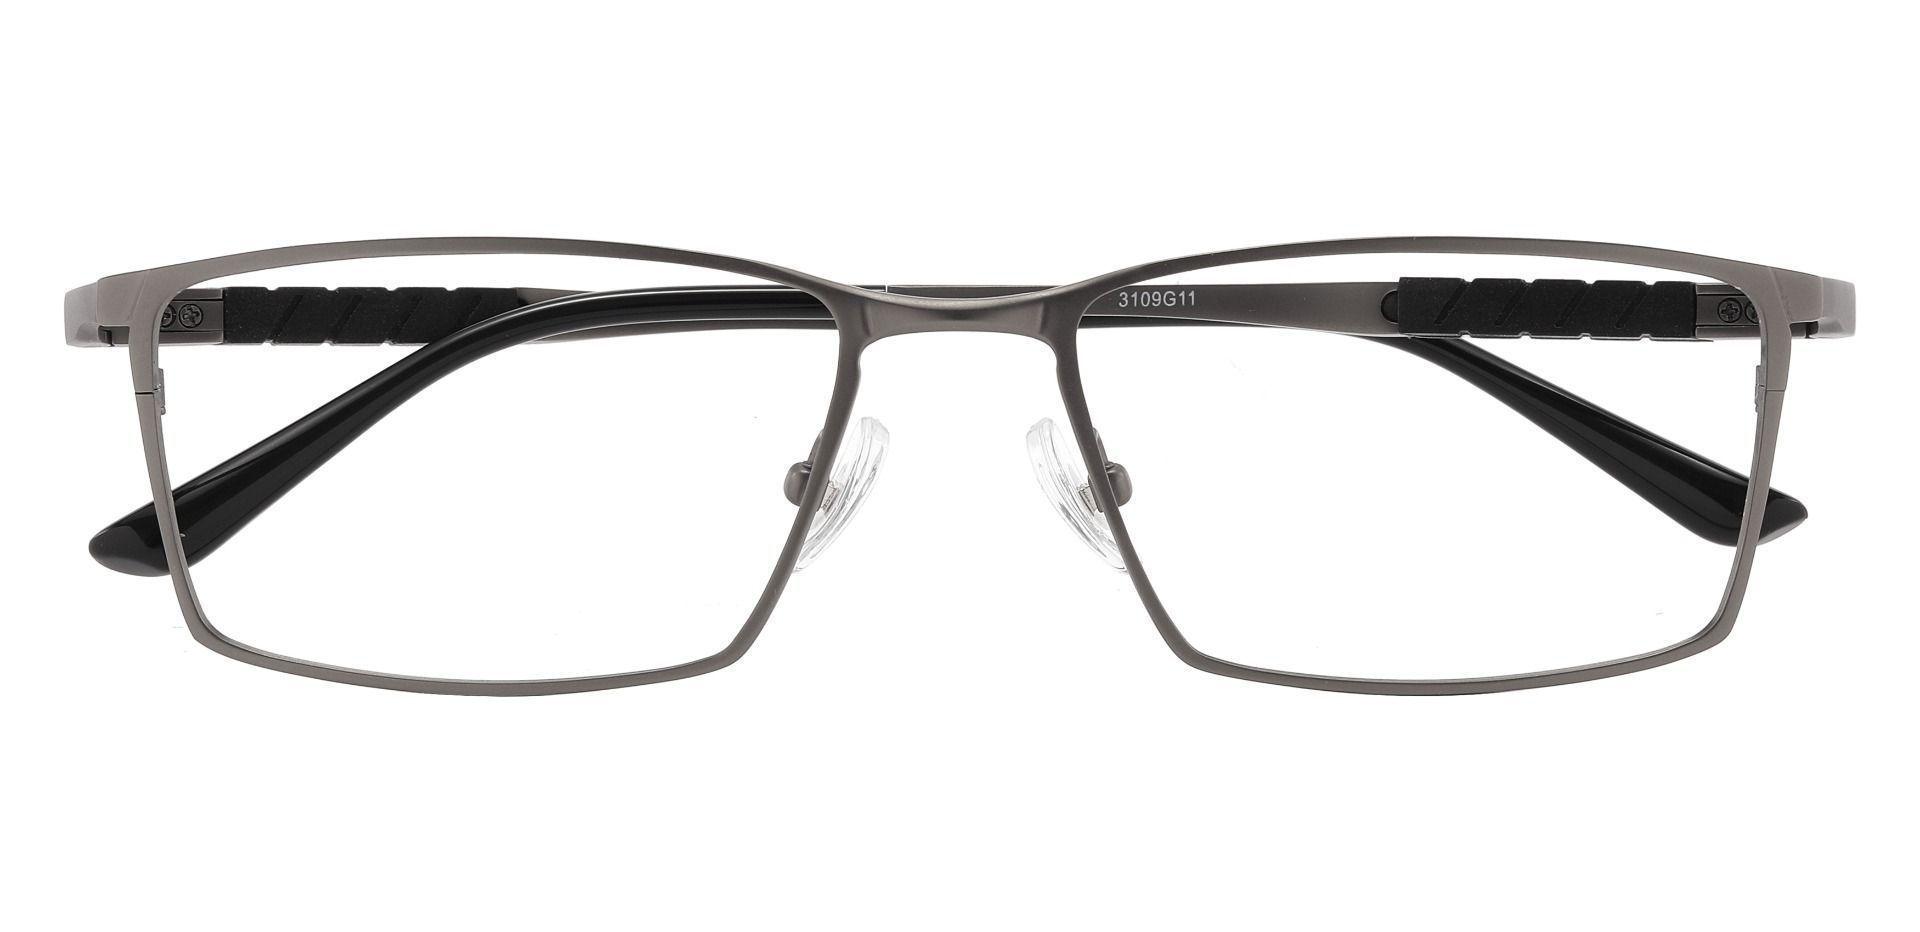 Elmore Rectangle Prescription Glasses - Gray